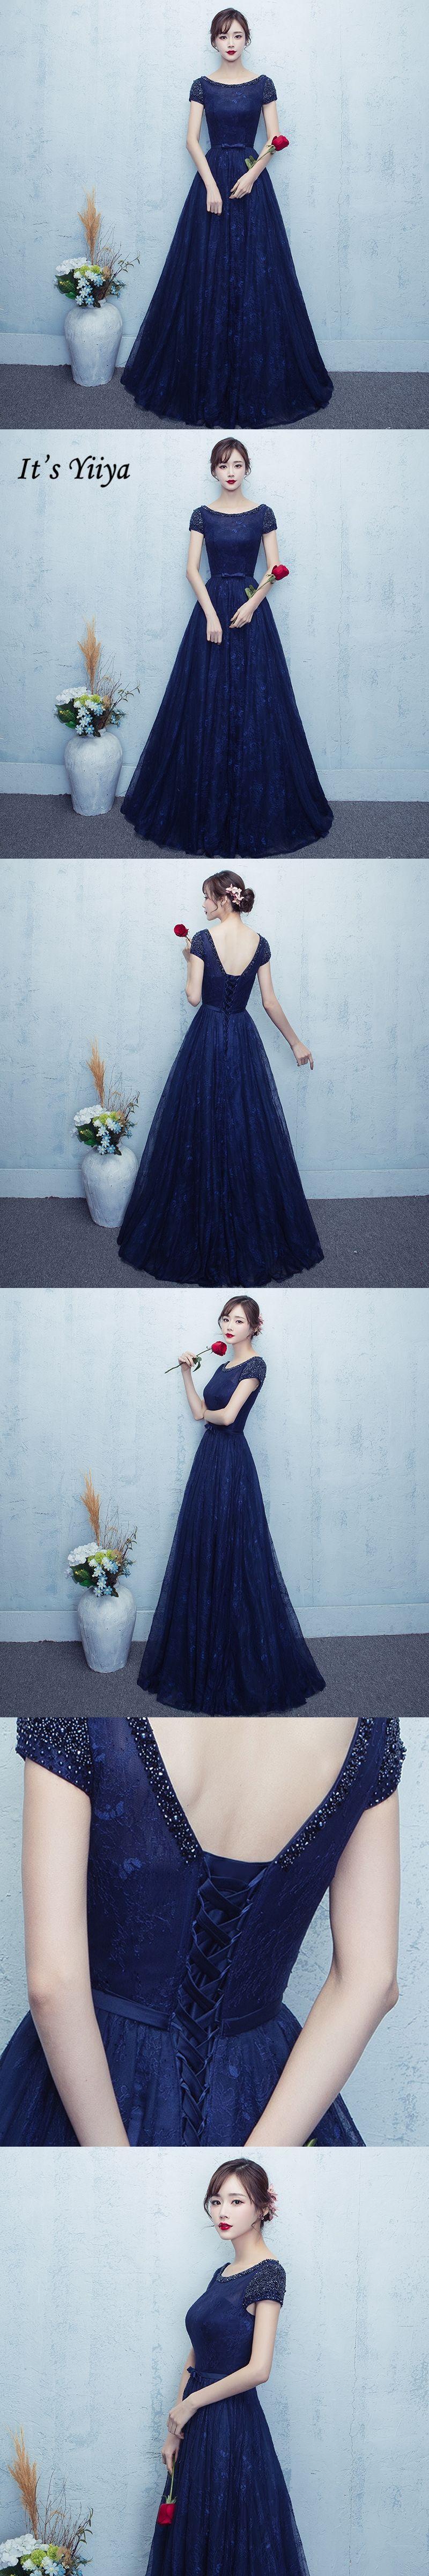 Itus yiiya new navy blue short sleeve oneck prom dresses